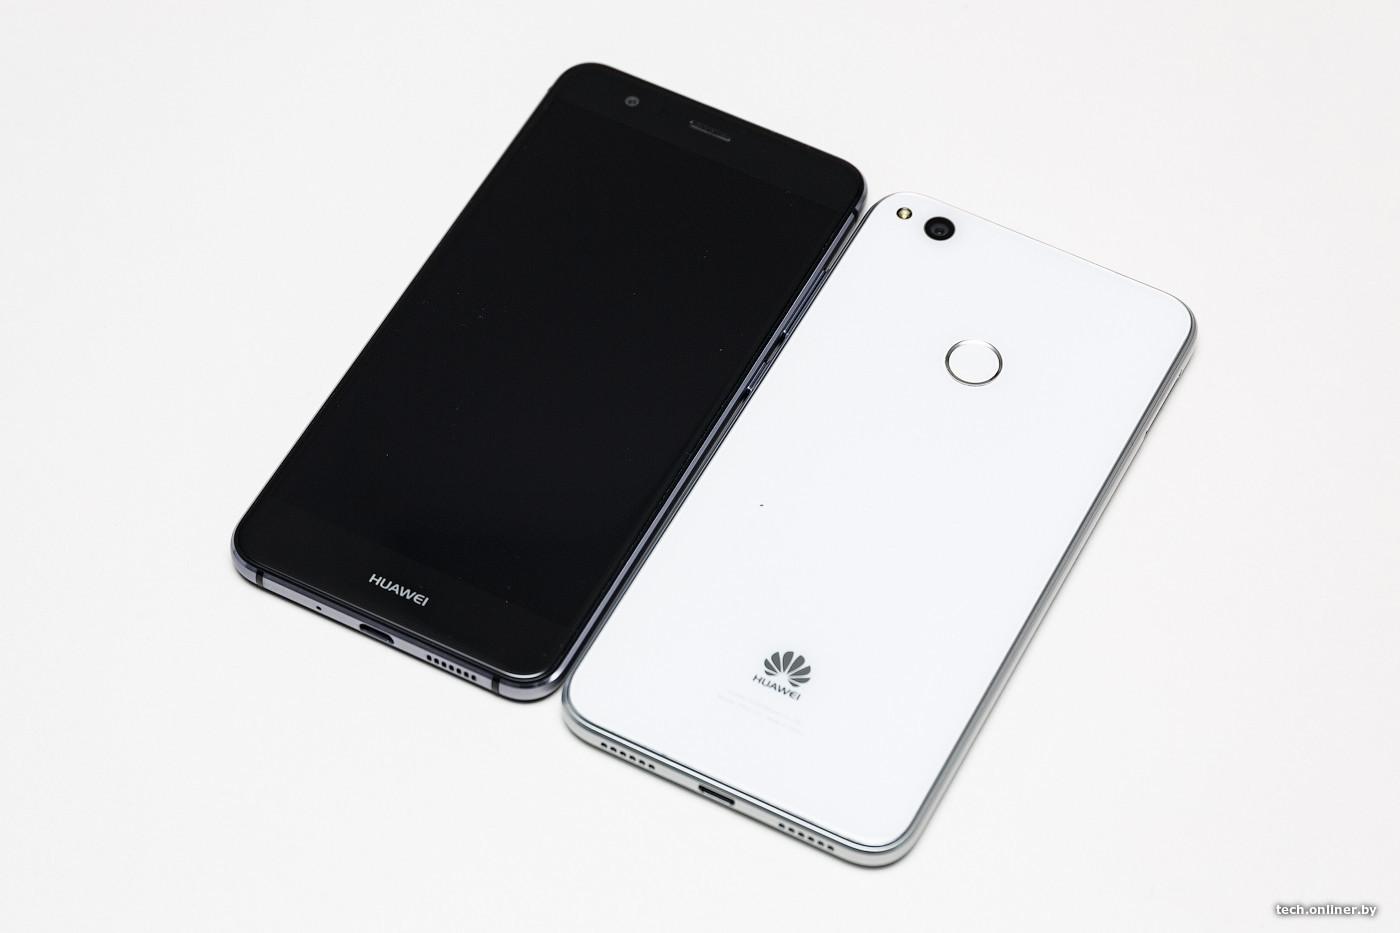 Huawei p9 lite mini характеристики, обзор, отзывы, дата выхода.